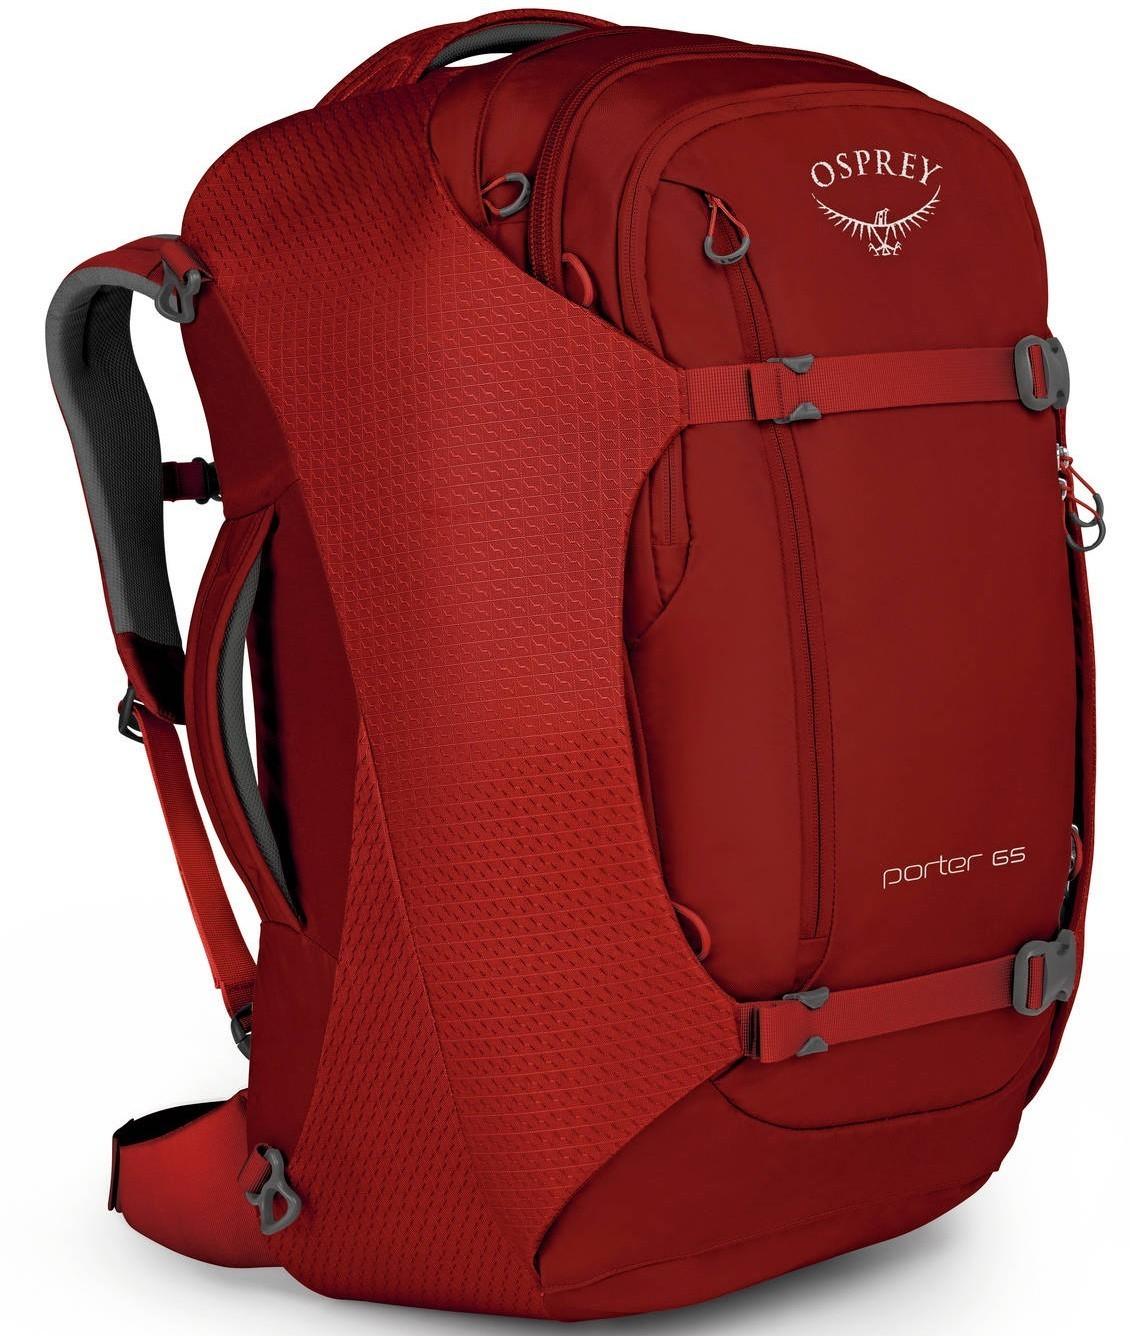 Сумки-рюкзаки Сумка-рюкзак Osprey Porter 65 Diablo Red Porter_65_F17_Side_Diablo_Red_web.jpg